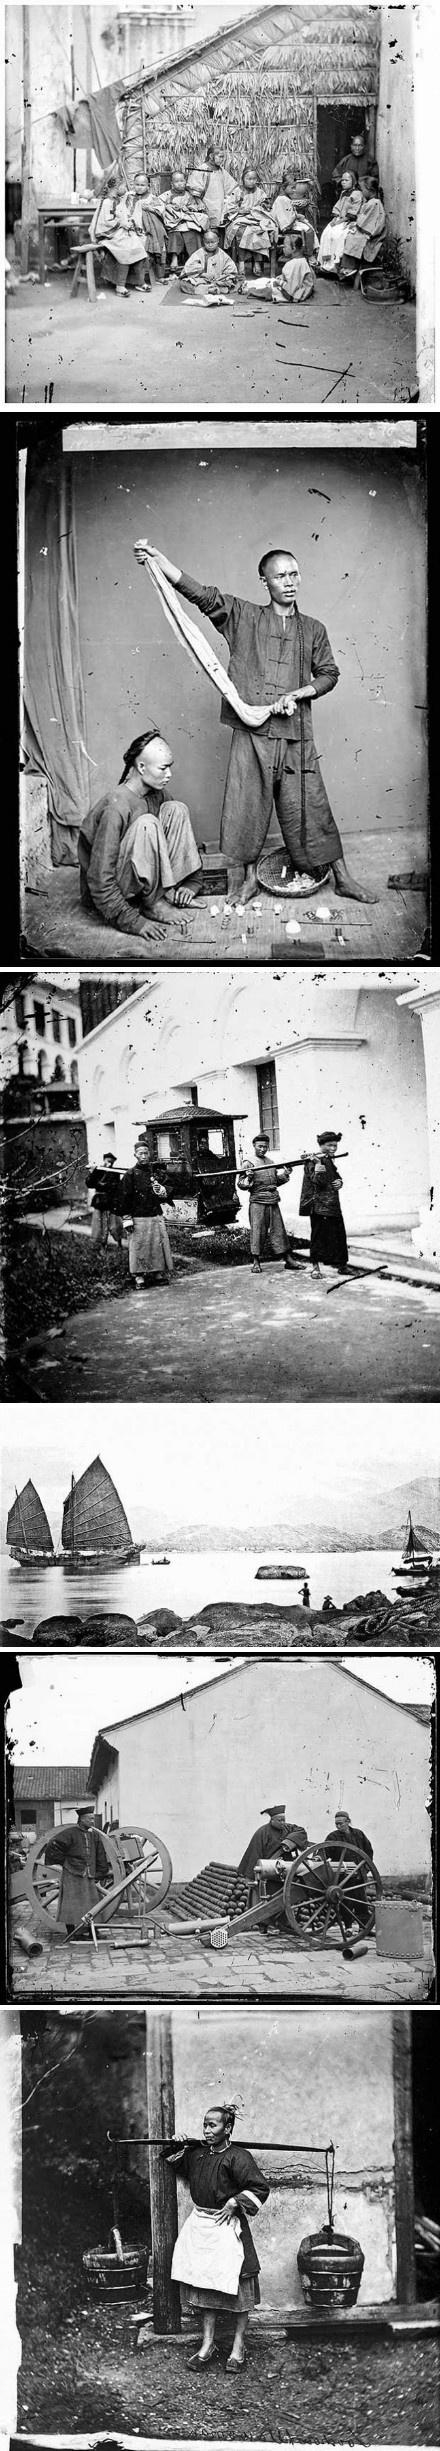 John Thomson<19世纪的中国影像>